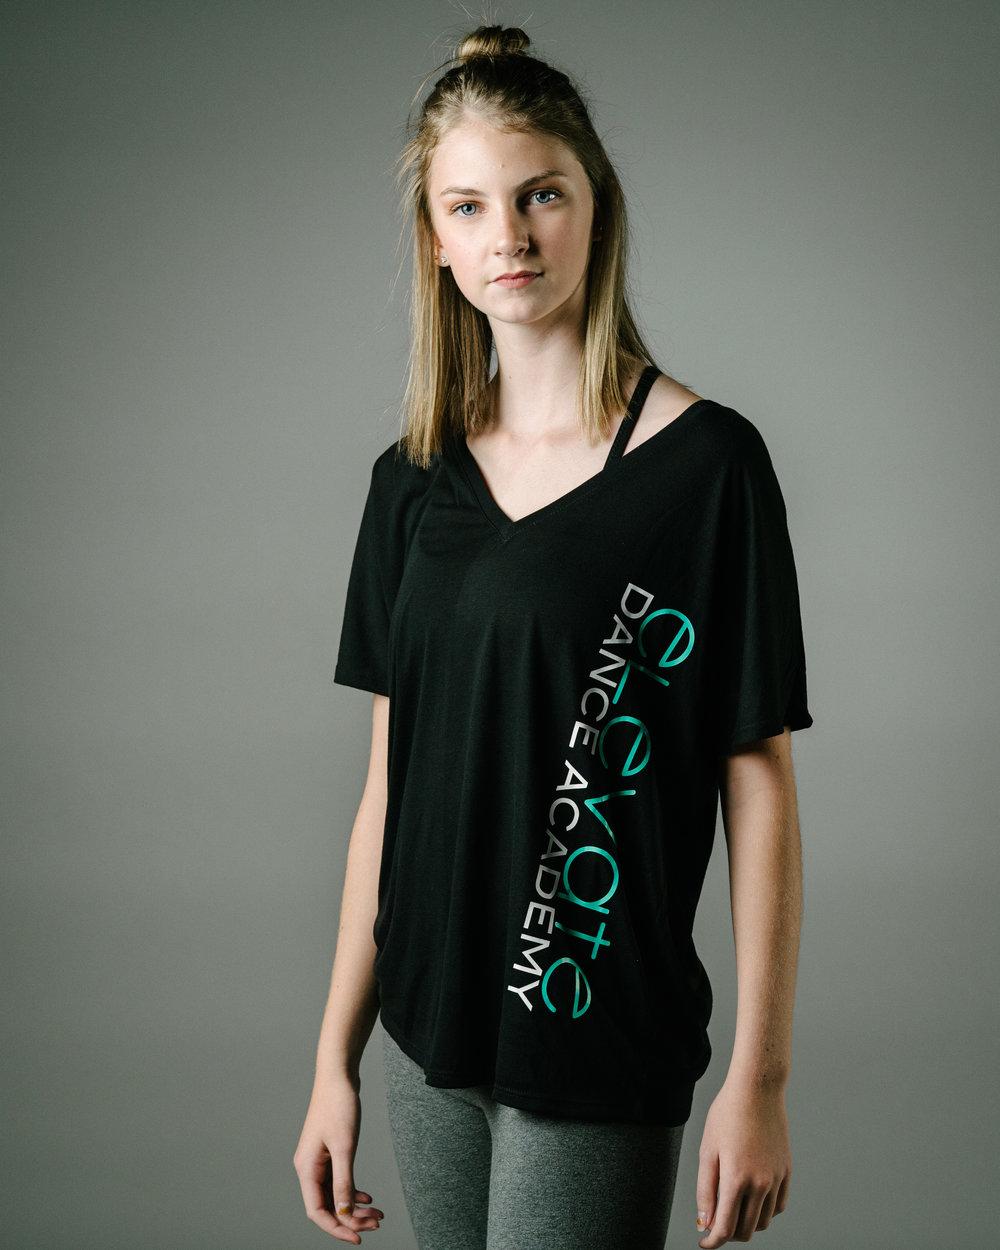 Slouchy Black V-Neck T-Shirt (Elevate logo down the left side)